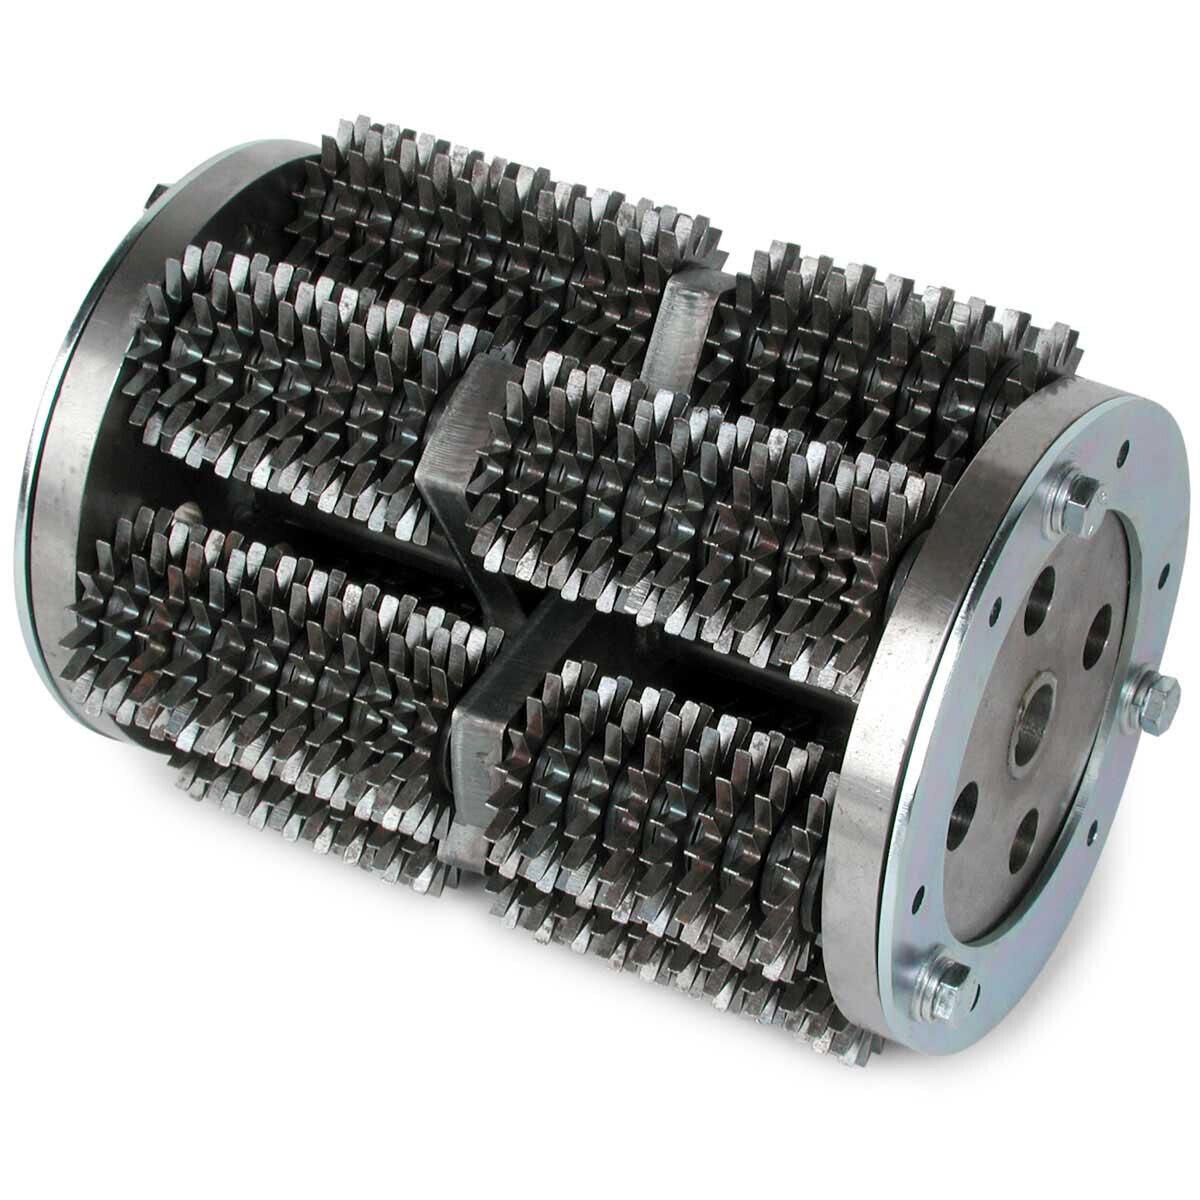 8 inch MK Diamond Scarifier Cutting Wheels